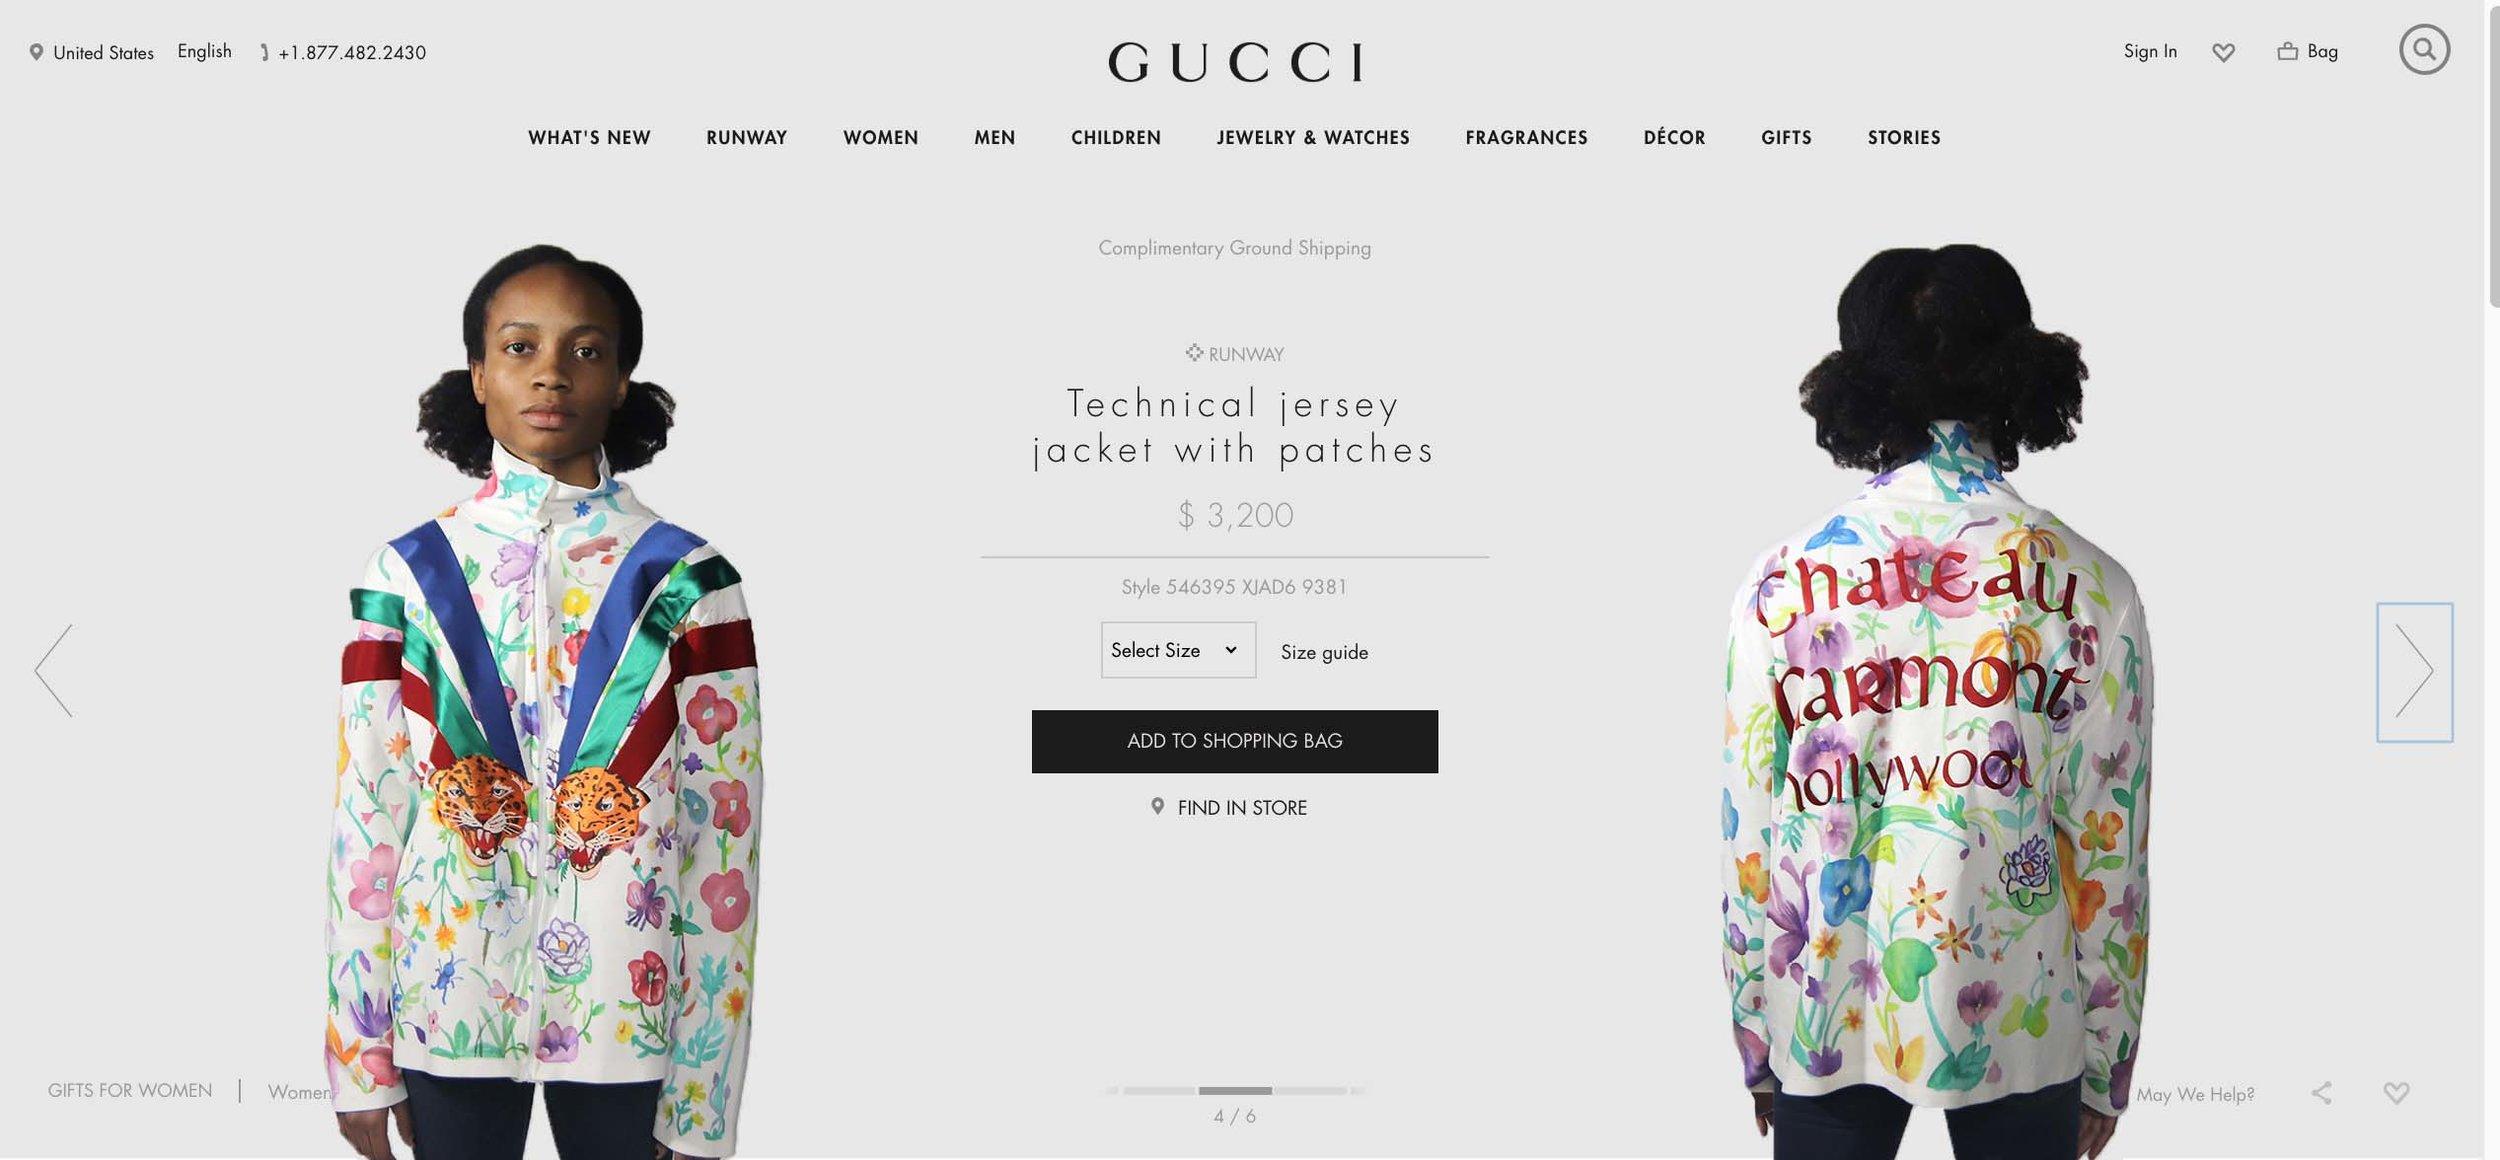 Gucci+Goodwill+homepage.jpg